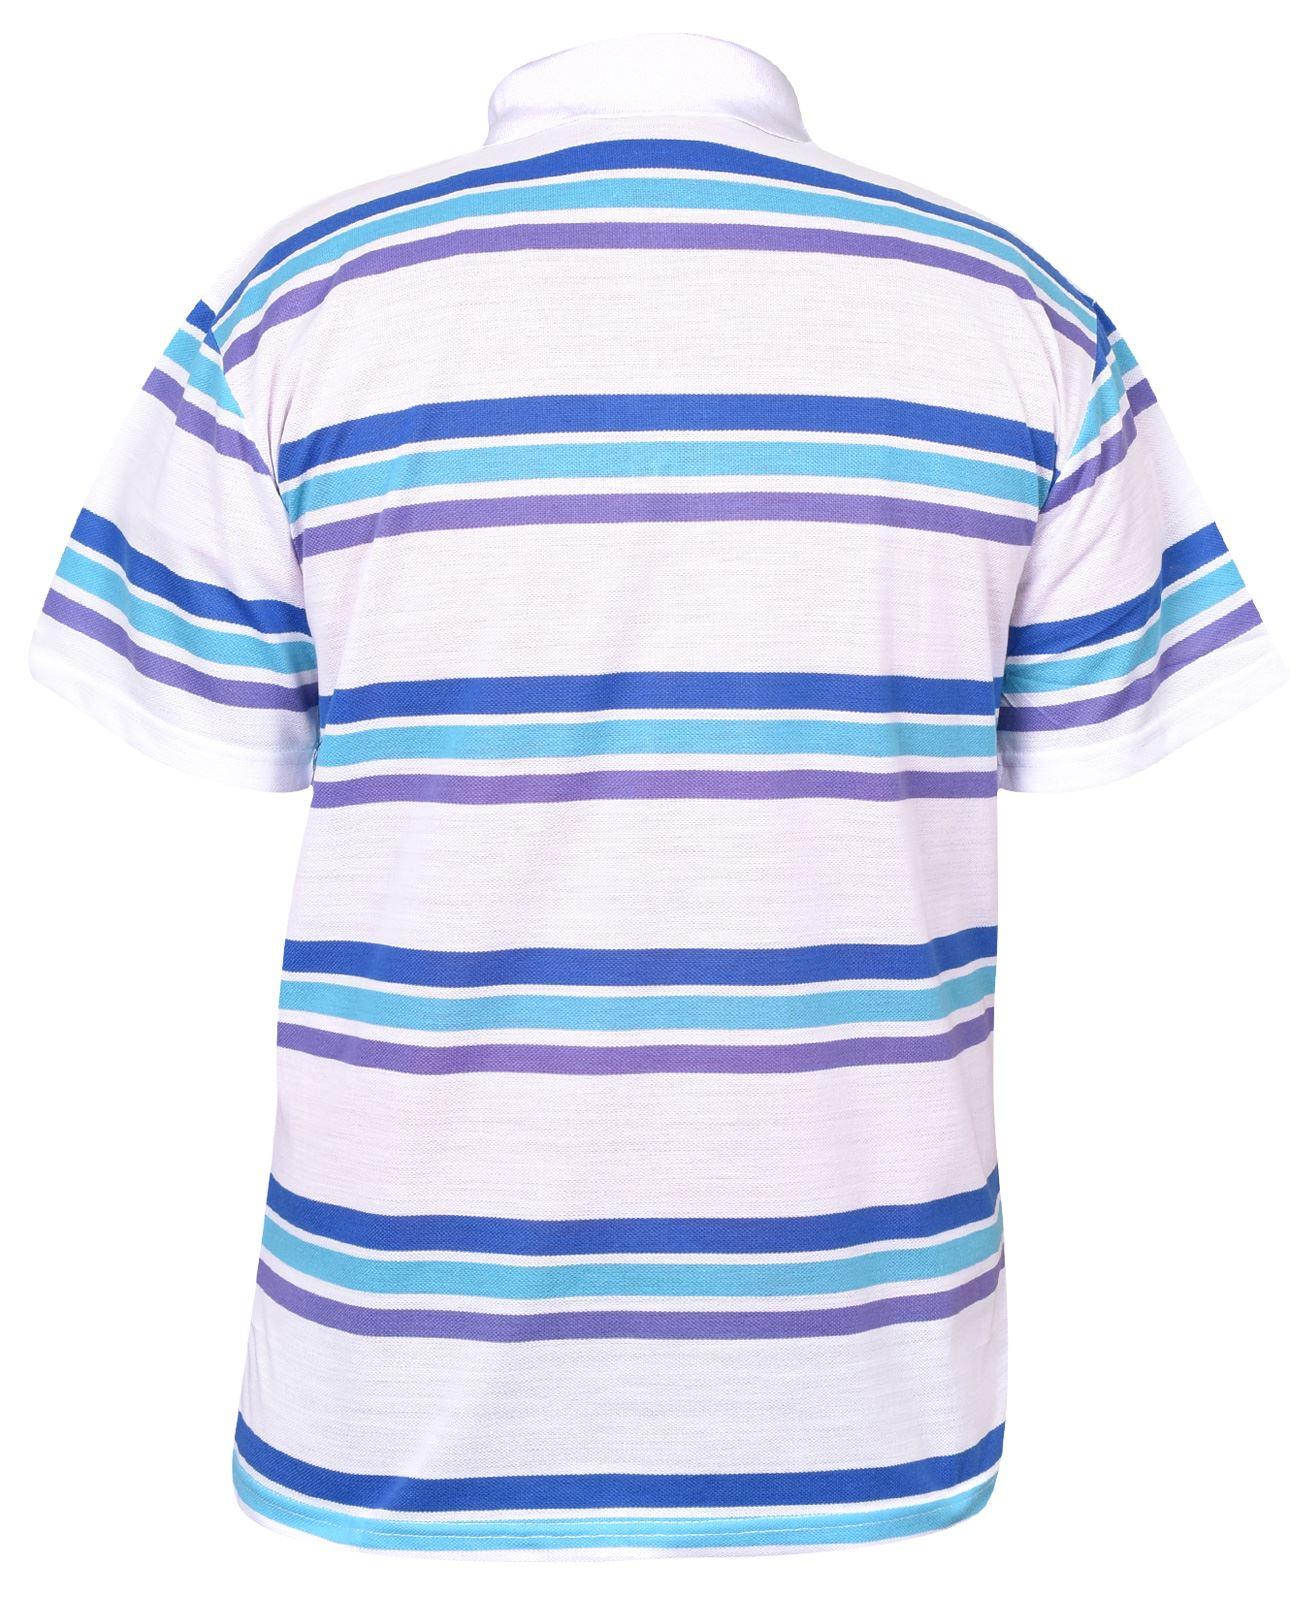 Mens-T-Shirts-Yarn-Dyed-Strip-Pocket-Polo-Shirt-Top-Multi-Colour-Size-M-3XL thumbnail 16